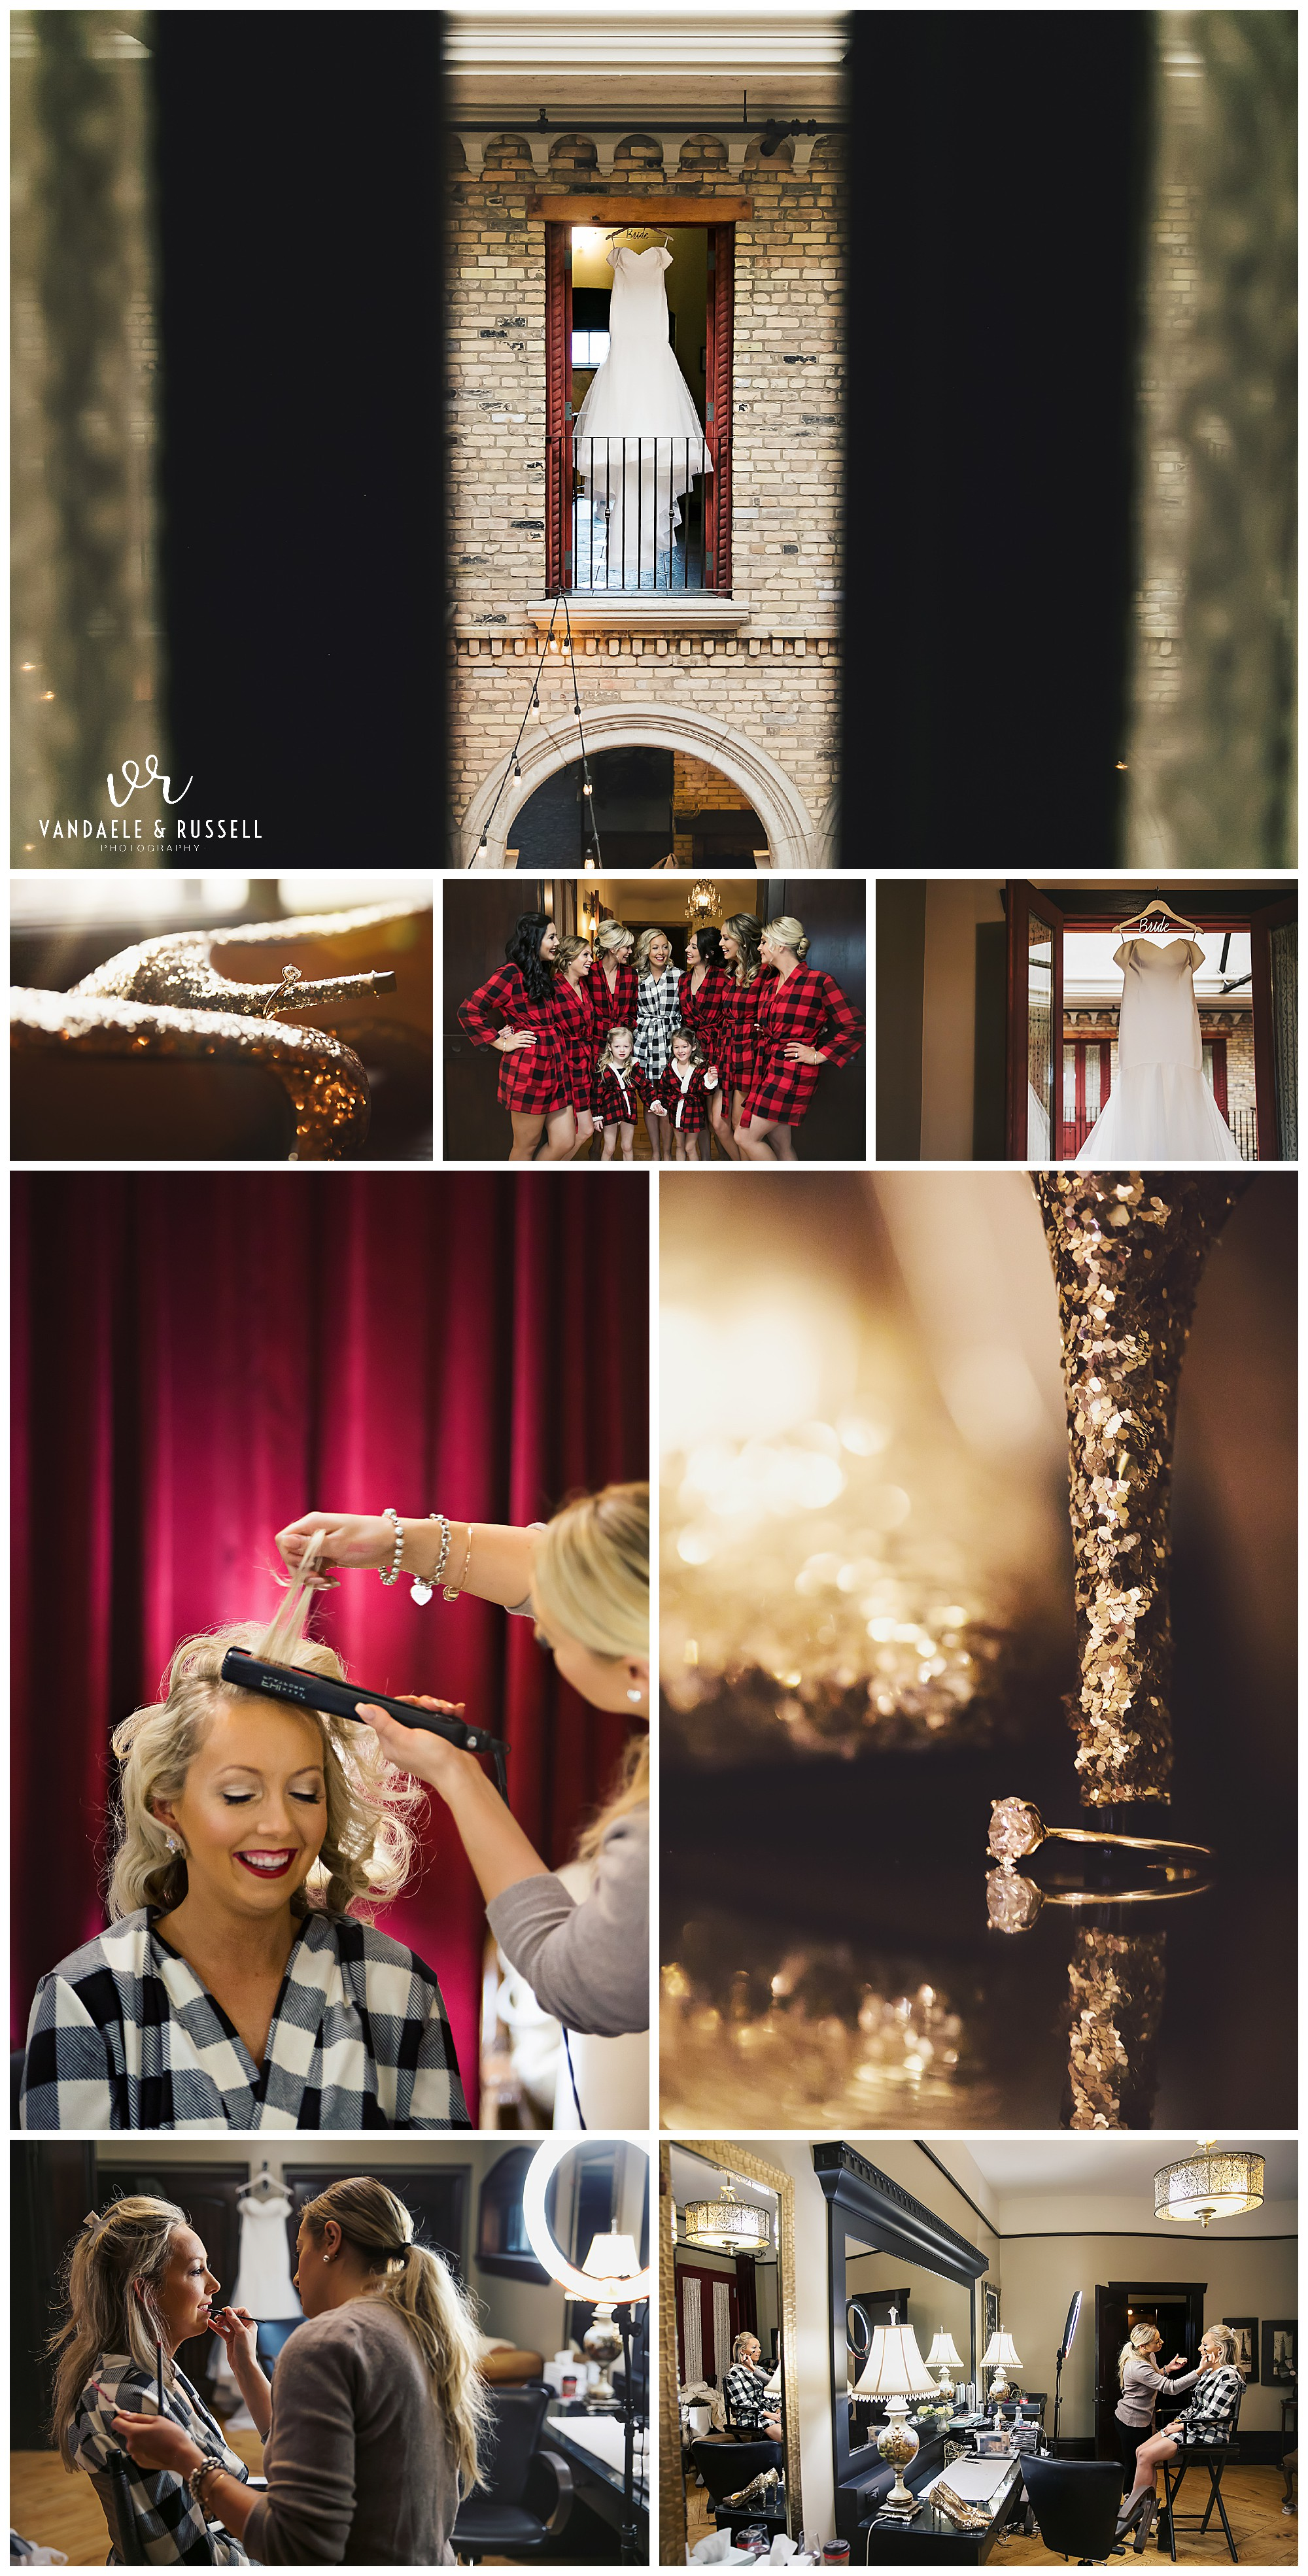 Hacienda-Sarria-Wedding-Photos-NYE-Michelle-Matt-VanDaele-Russell_0004.jpg